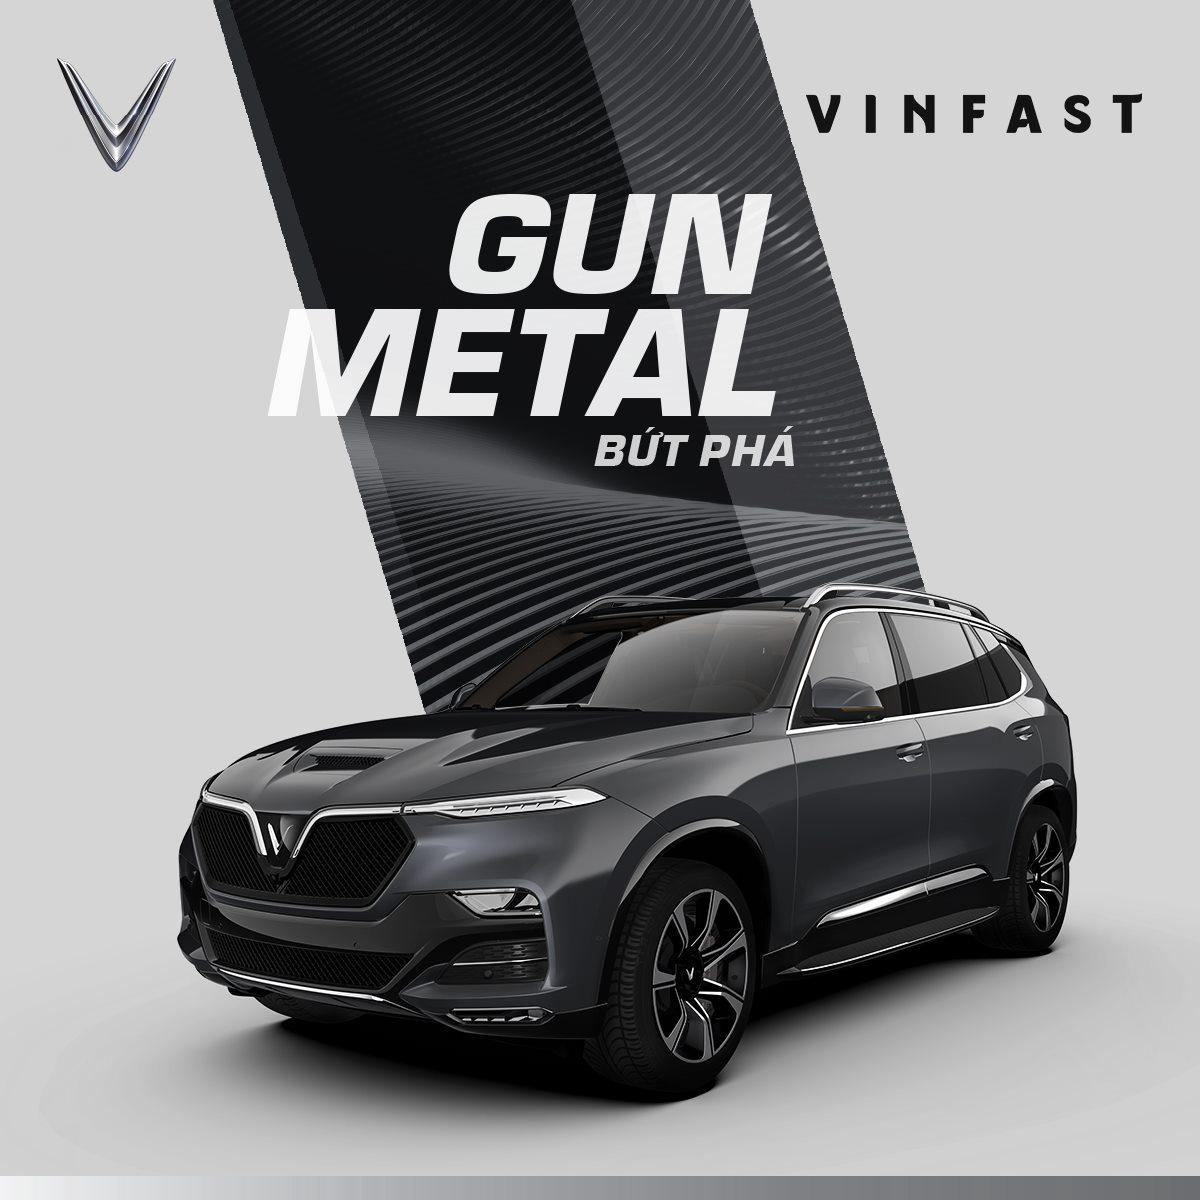 vinfast-president-gun-metal